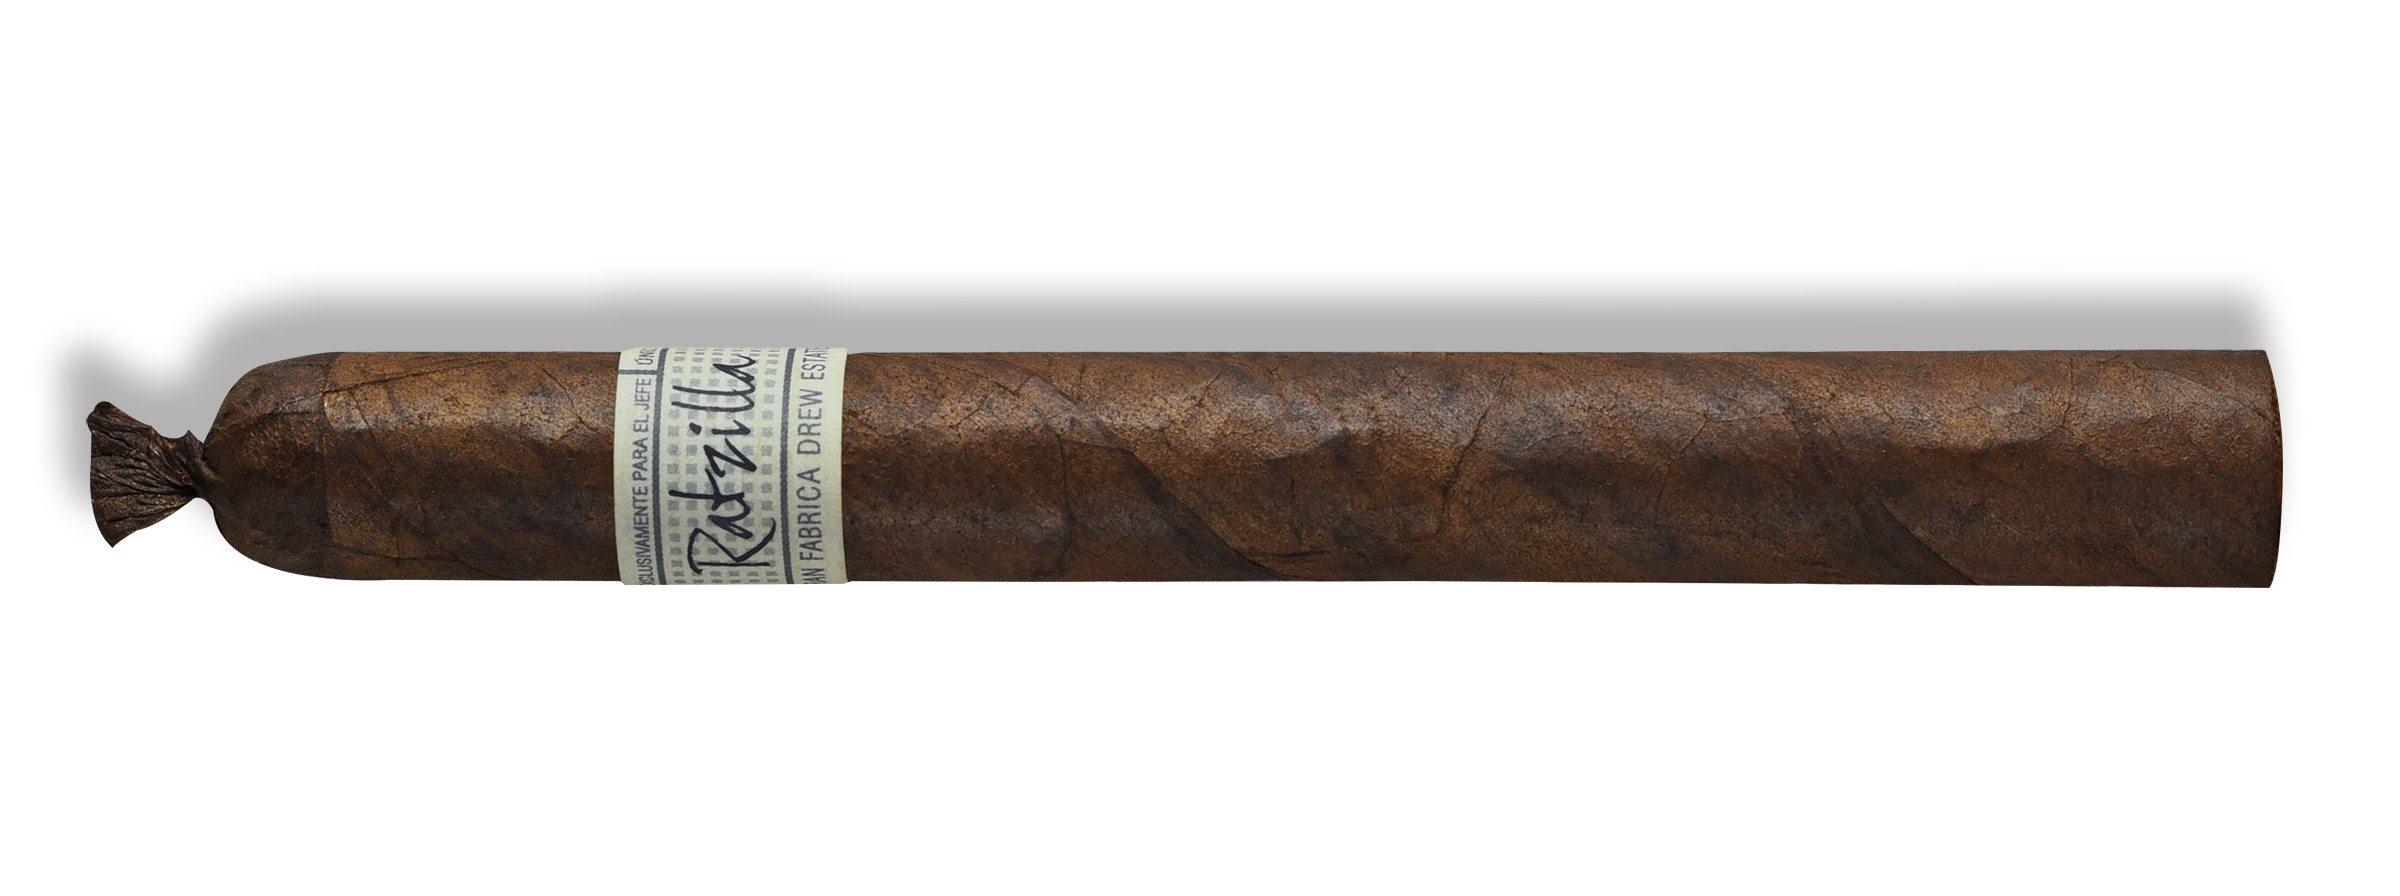 Cigar News: Drew Estate Releases Liga Privada Único Serie Ratzilla As DDRP Exclusive